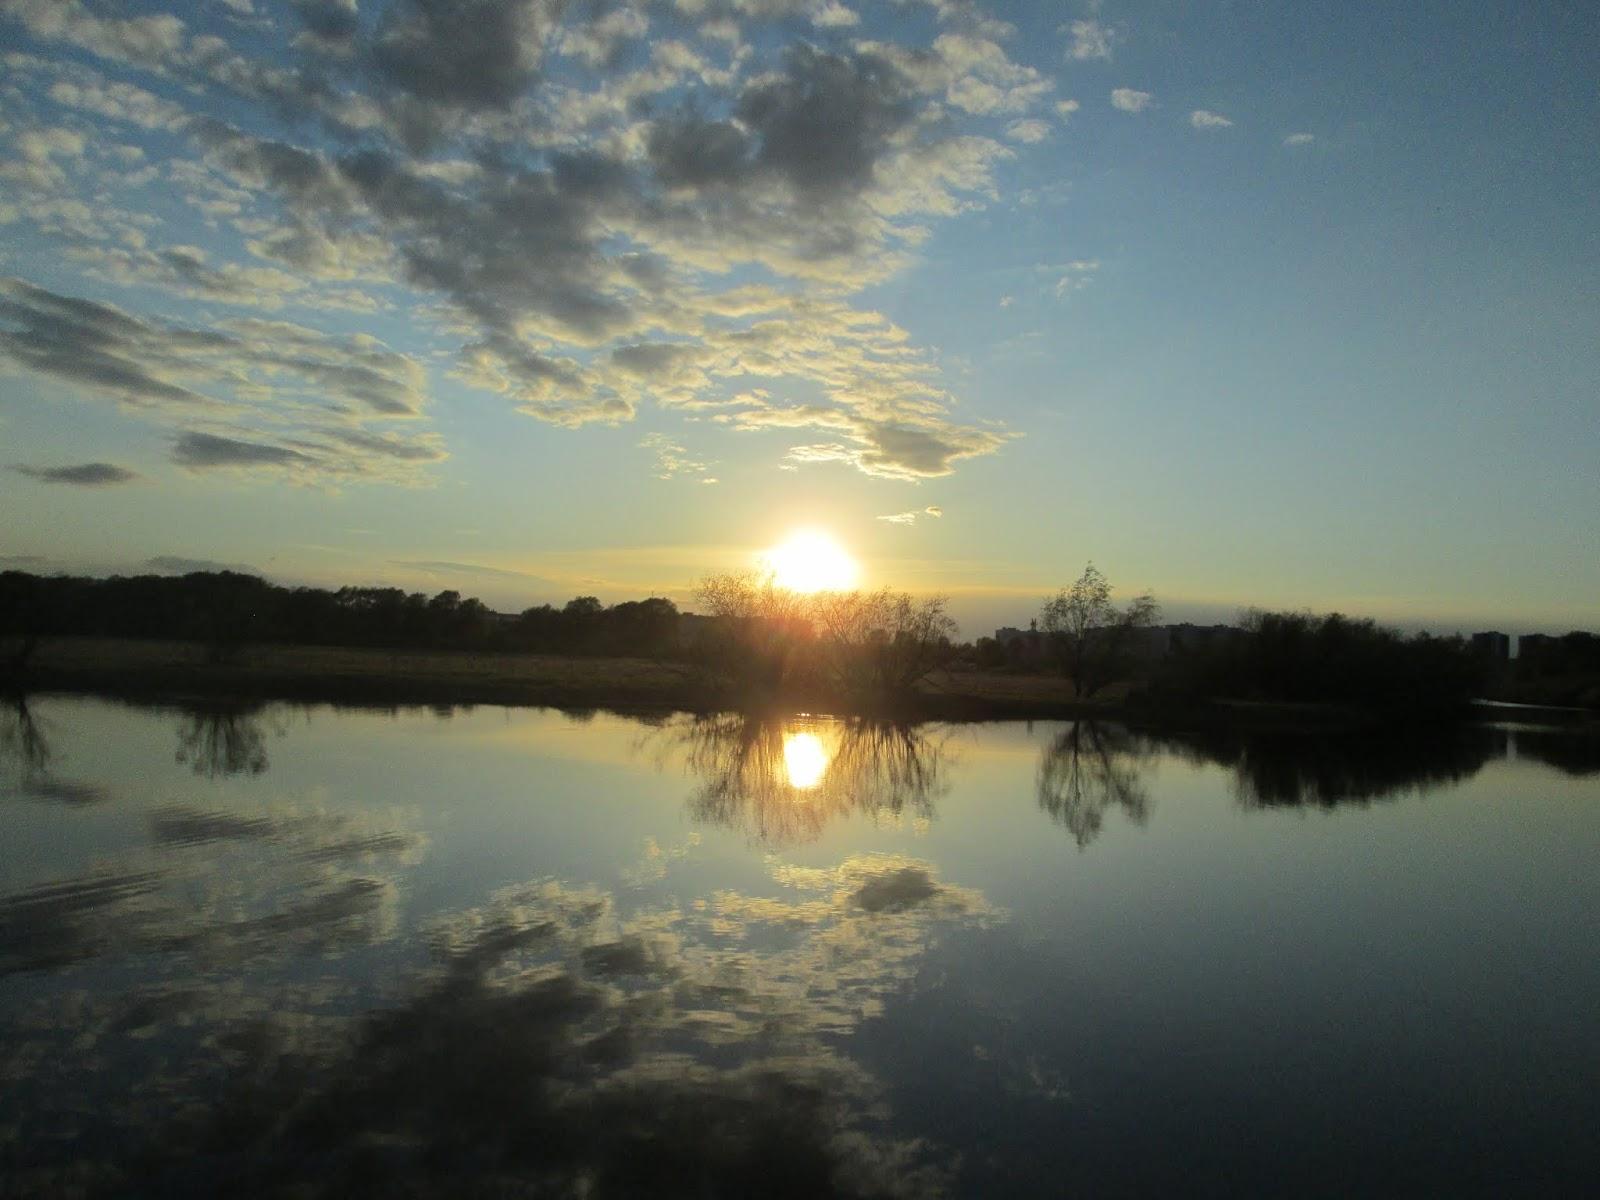 Река как зеркало